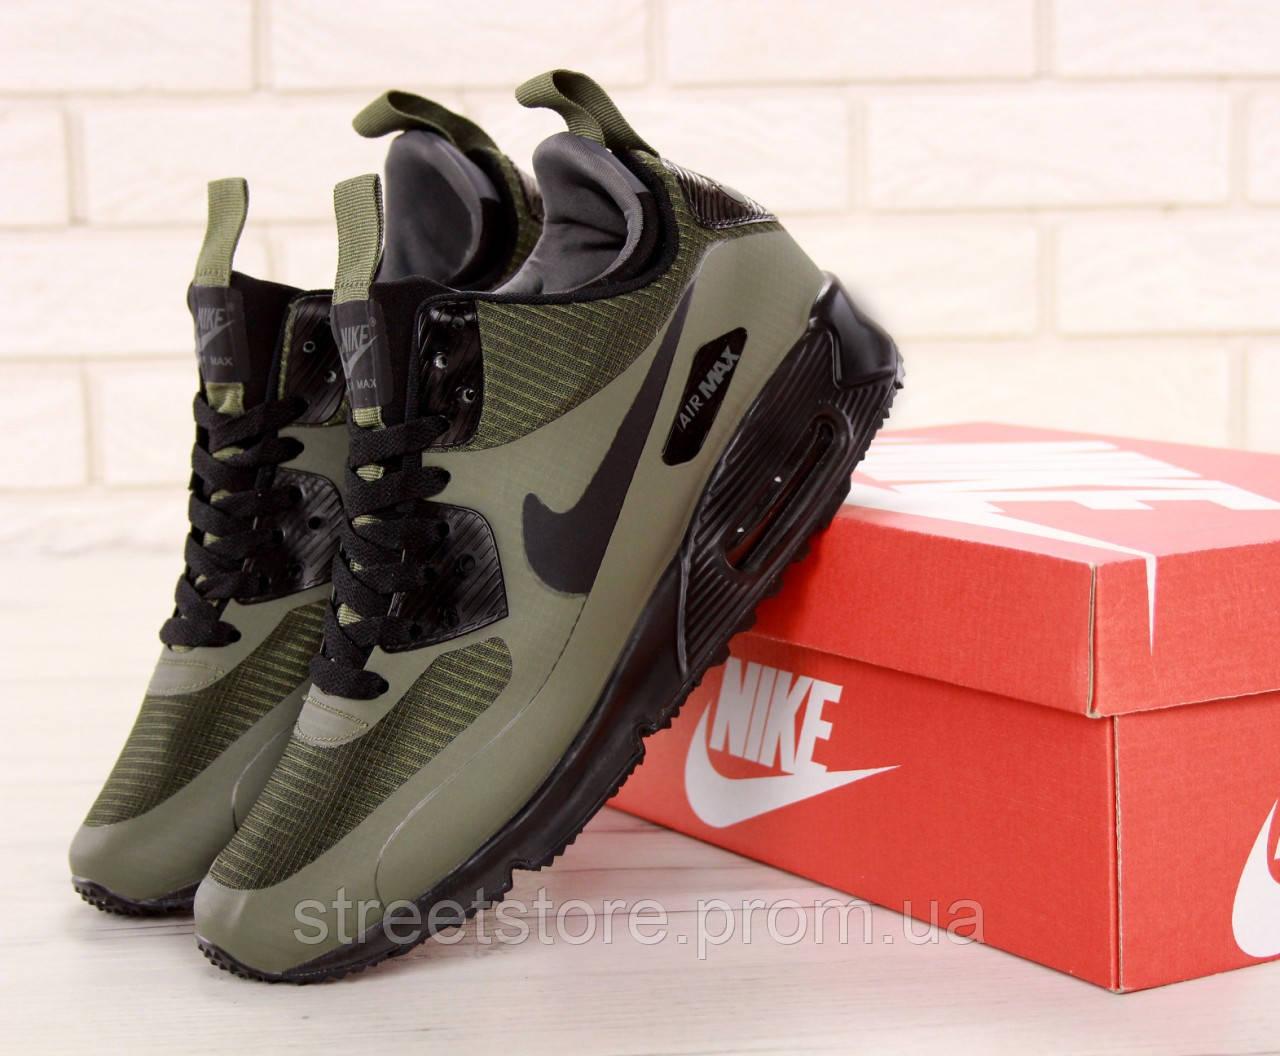 c1bbfb3c Кроссовки Мужские Nike Air Max 90 Mid Winter (Термоносок) — в ...